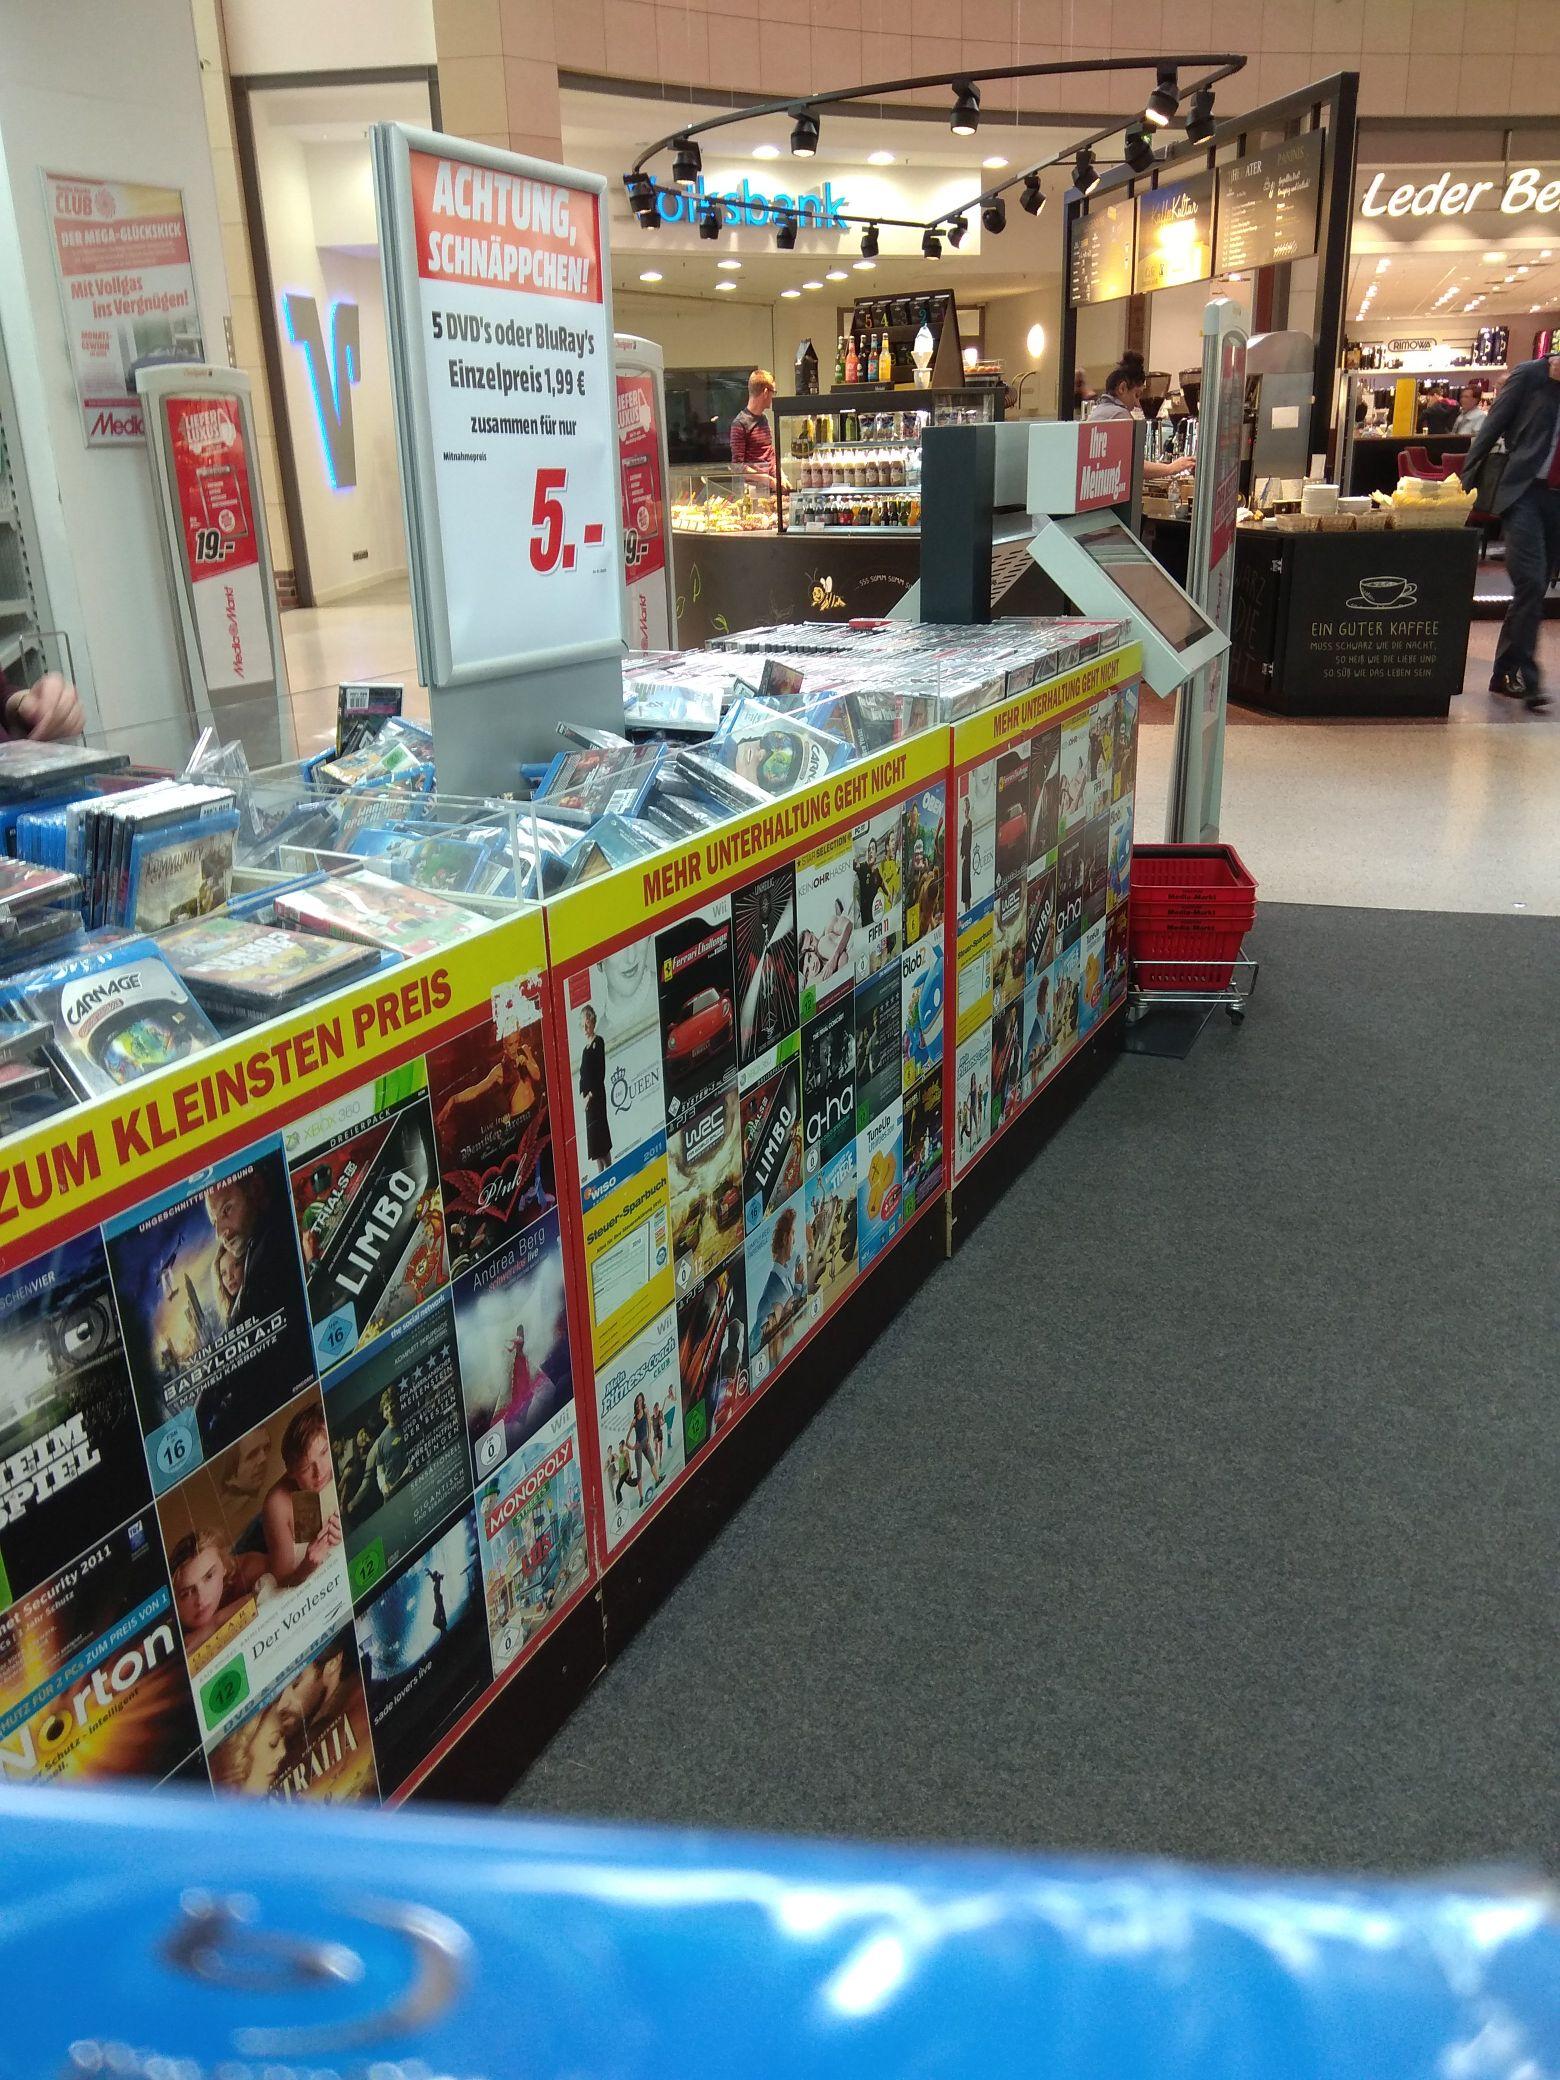 Lokal? Media Markt Lingen (Ems) 5 Blu-ray Filme für 5 Euro